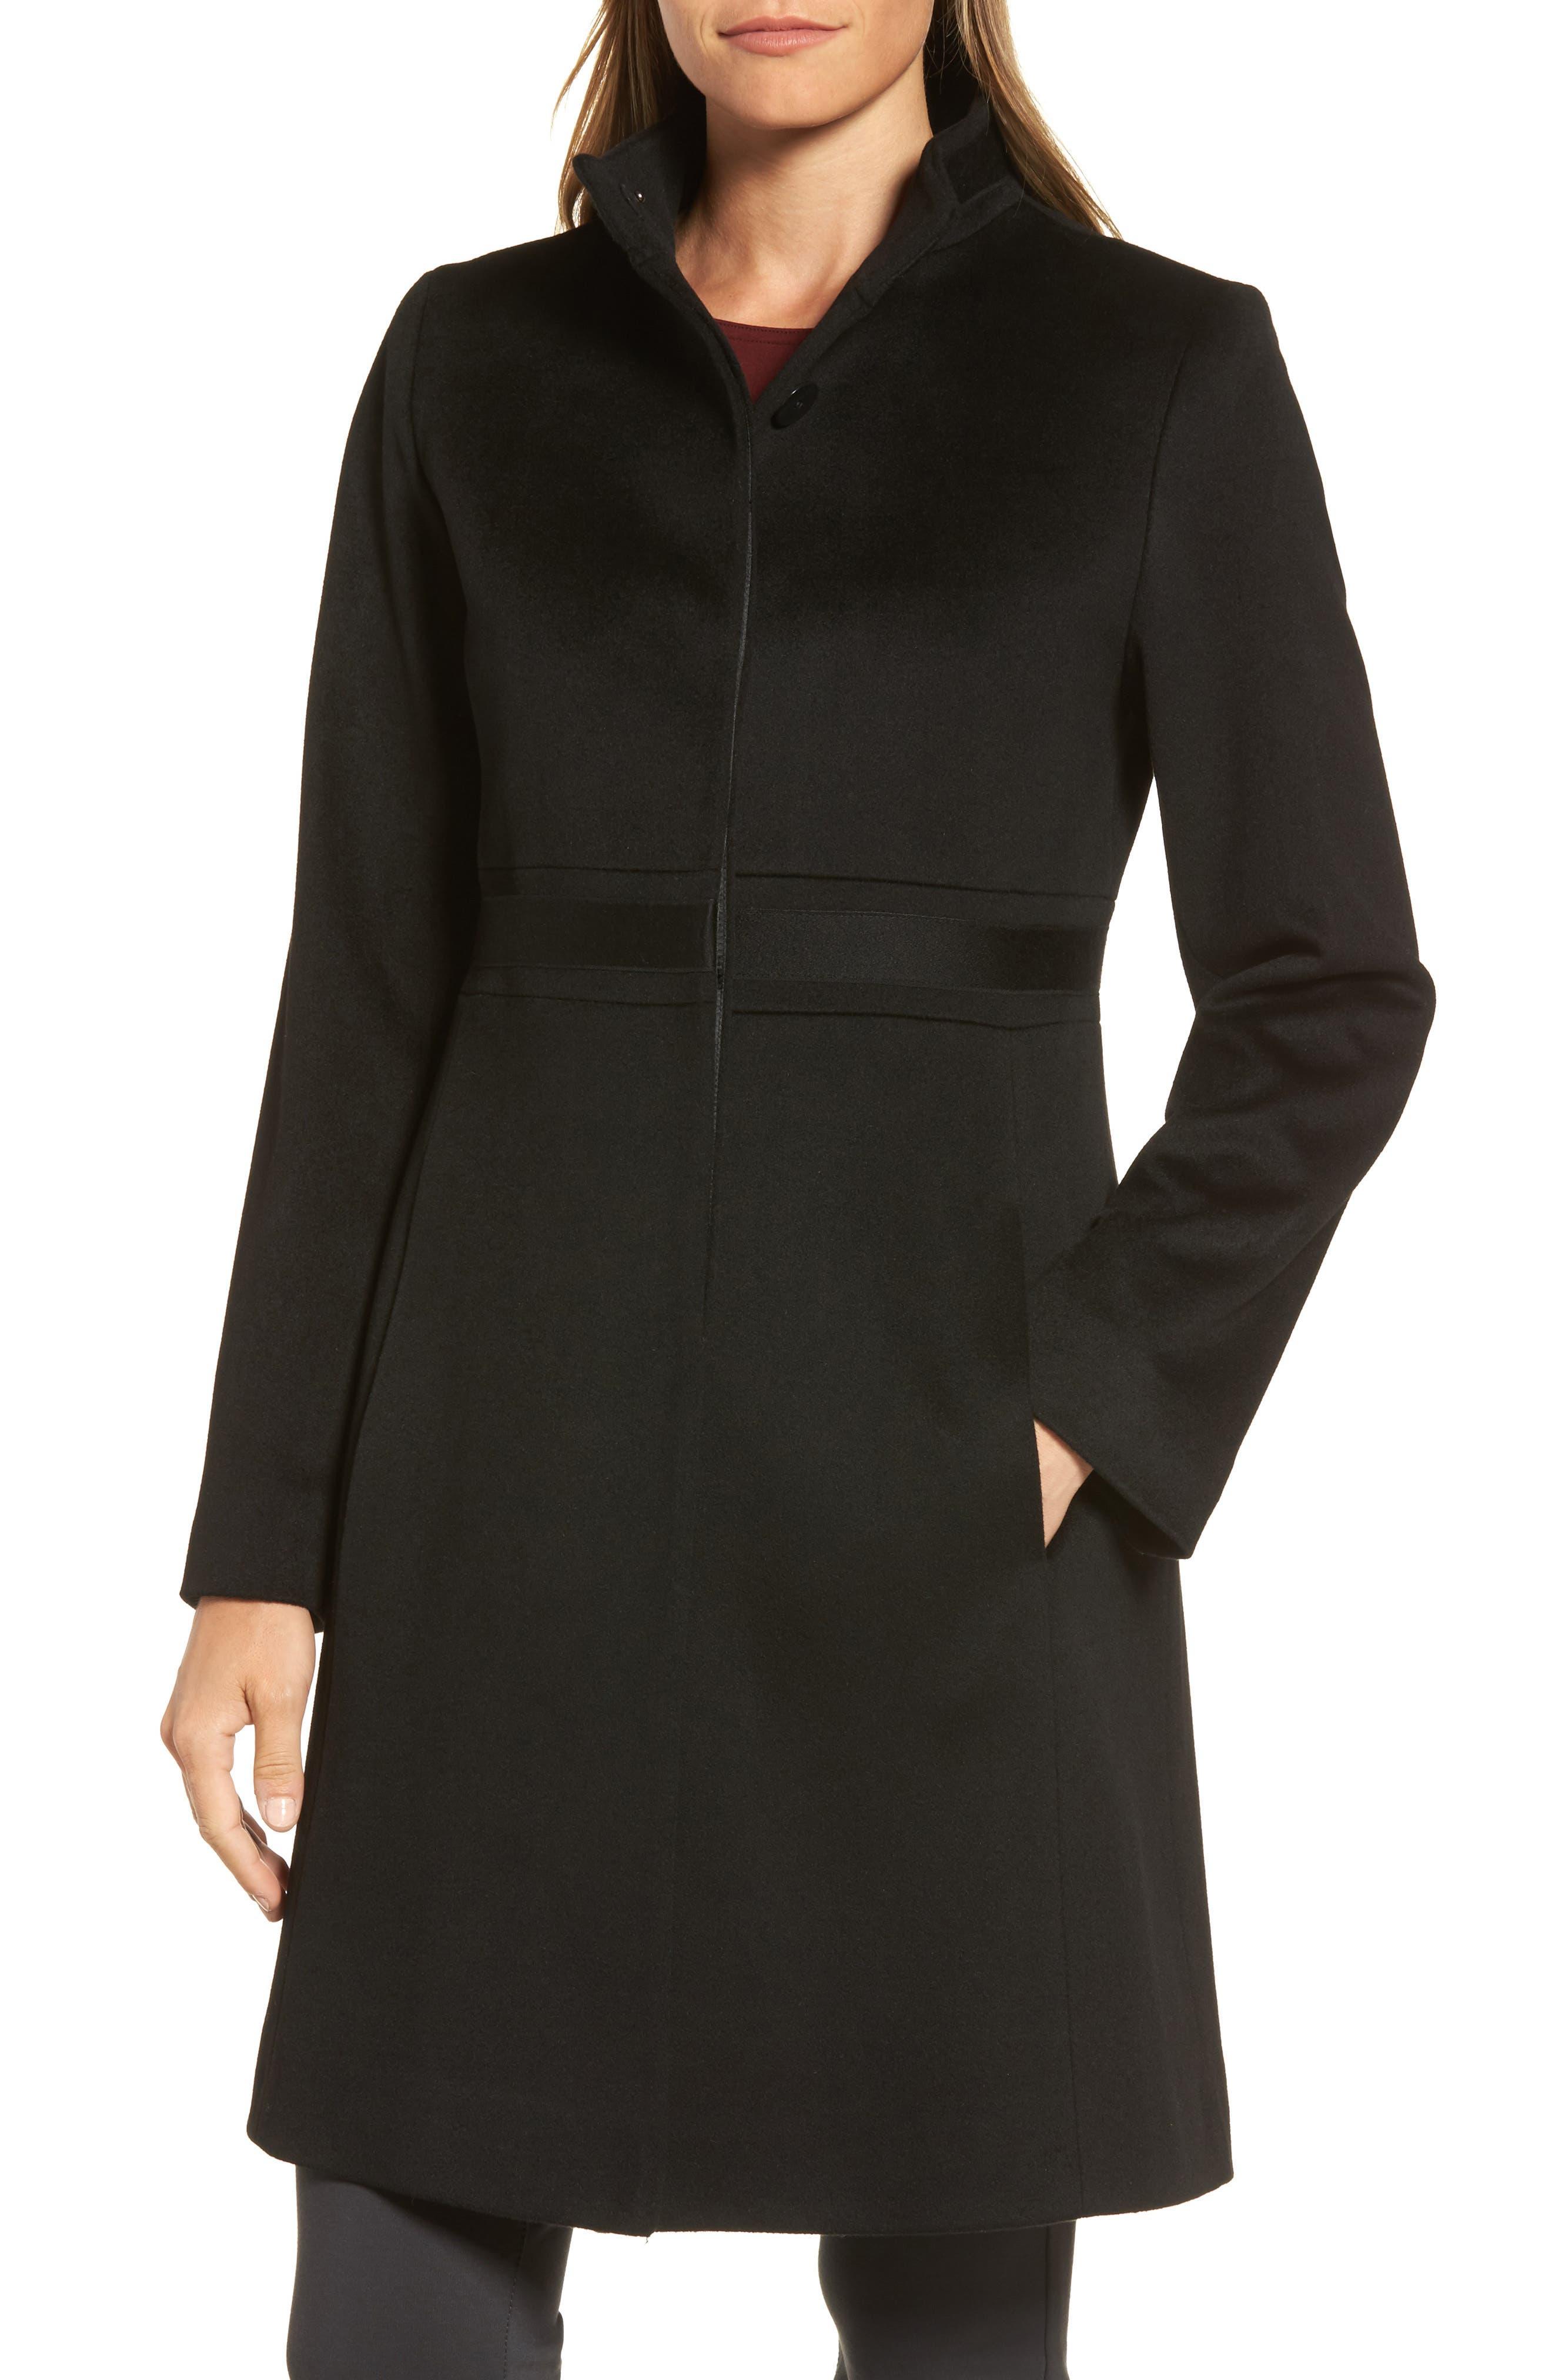 Alternate Image 1 Selected - Fleurette Appliqué Wool Coat (Regular & Petite)